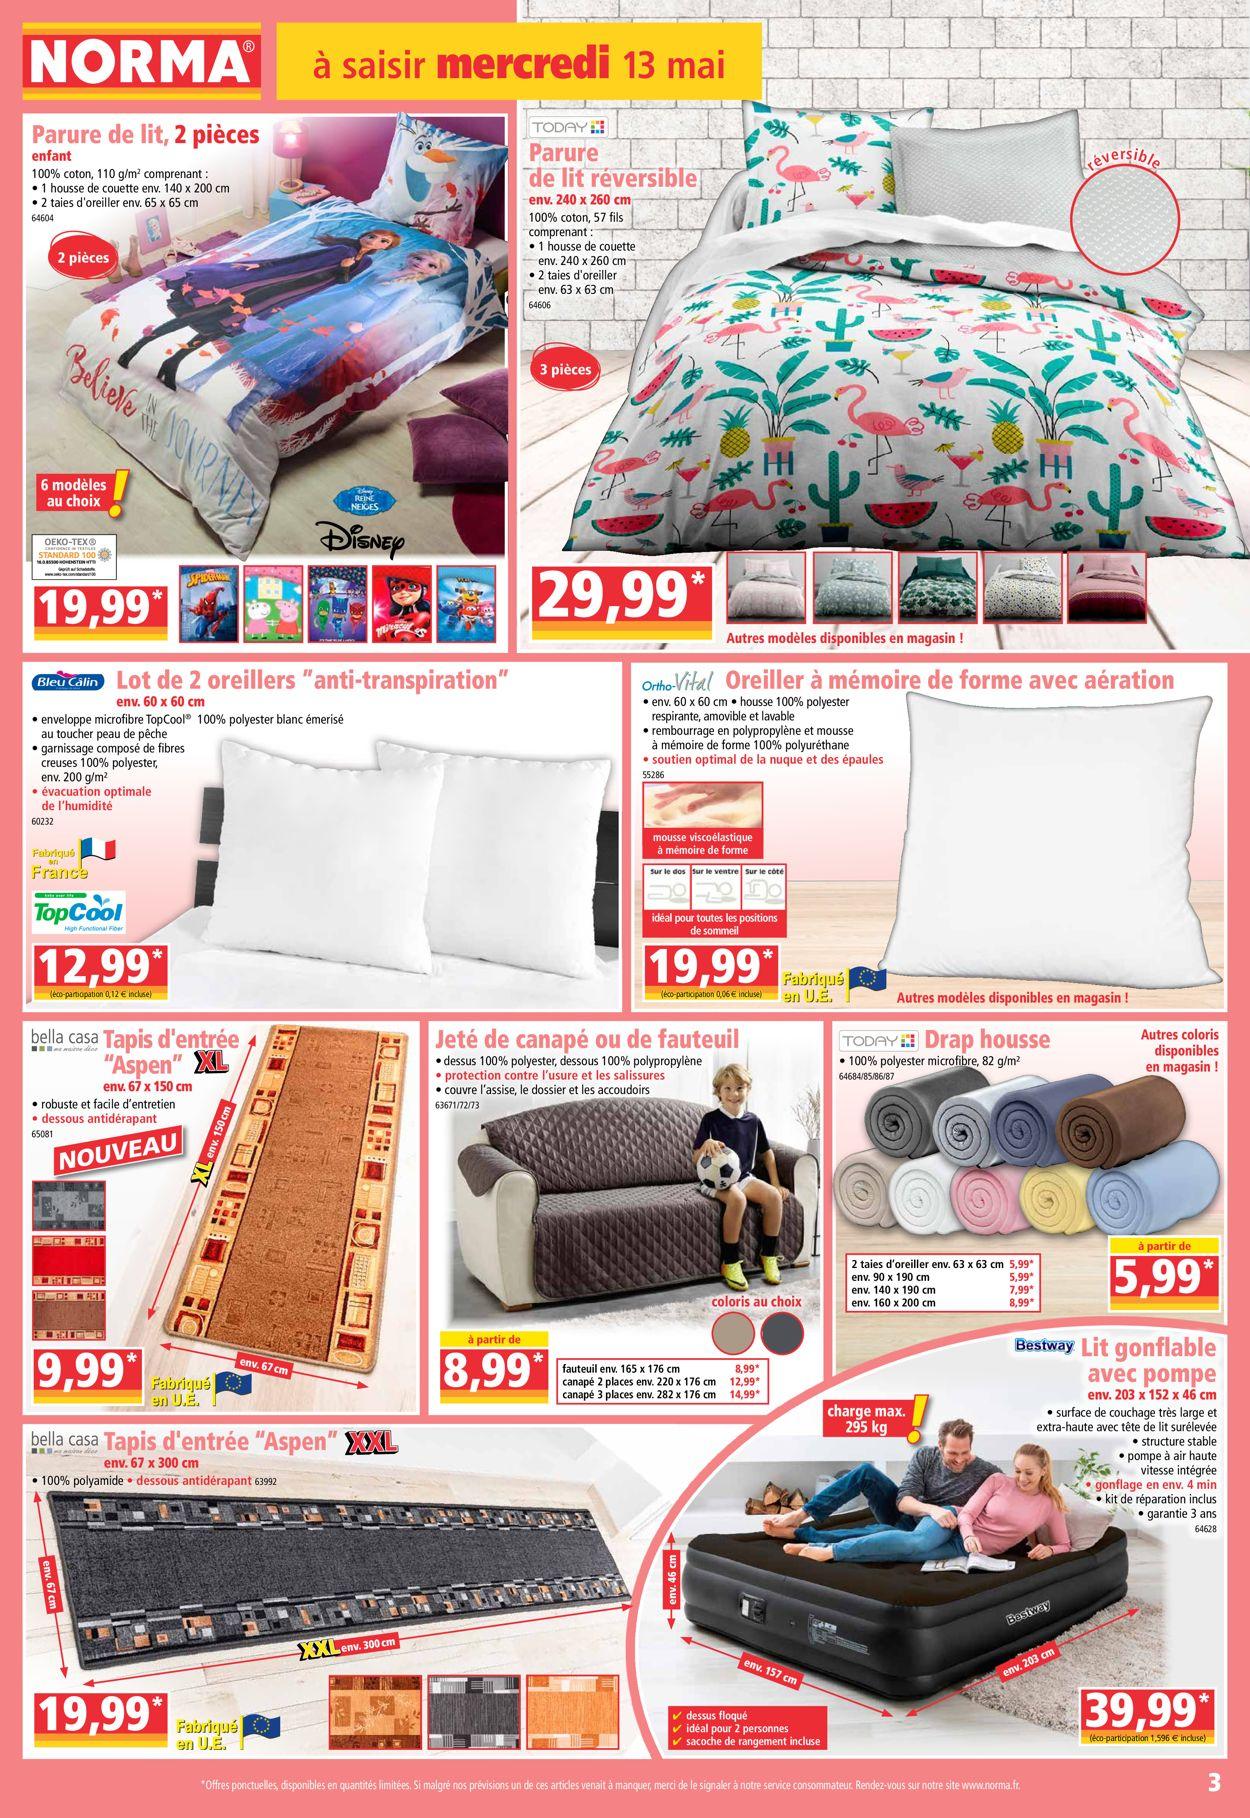 Norma Catalogue - 13.05-19.05.2020 (Page 3)